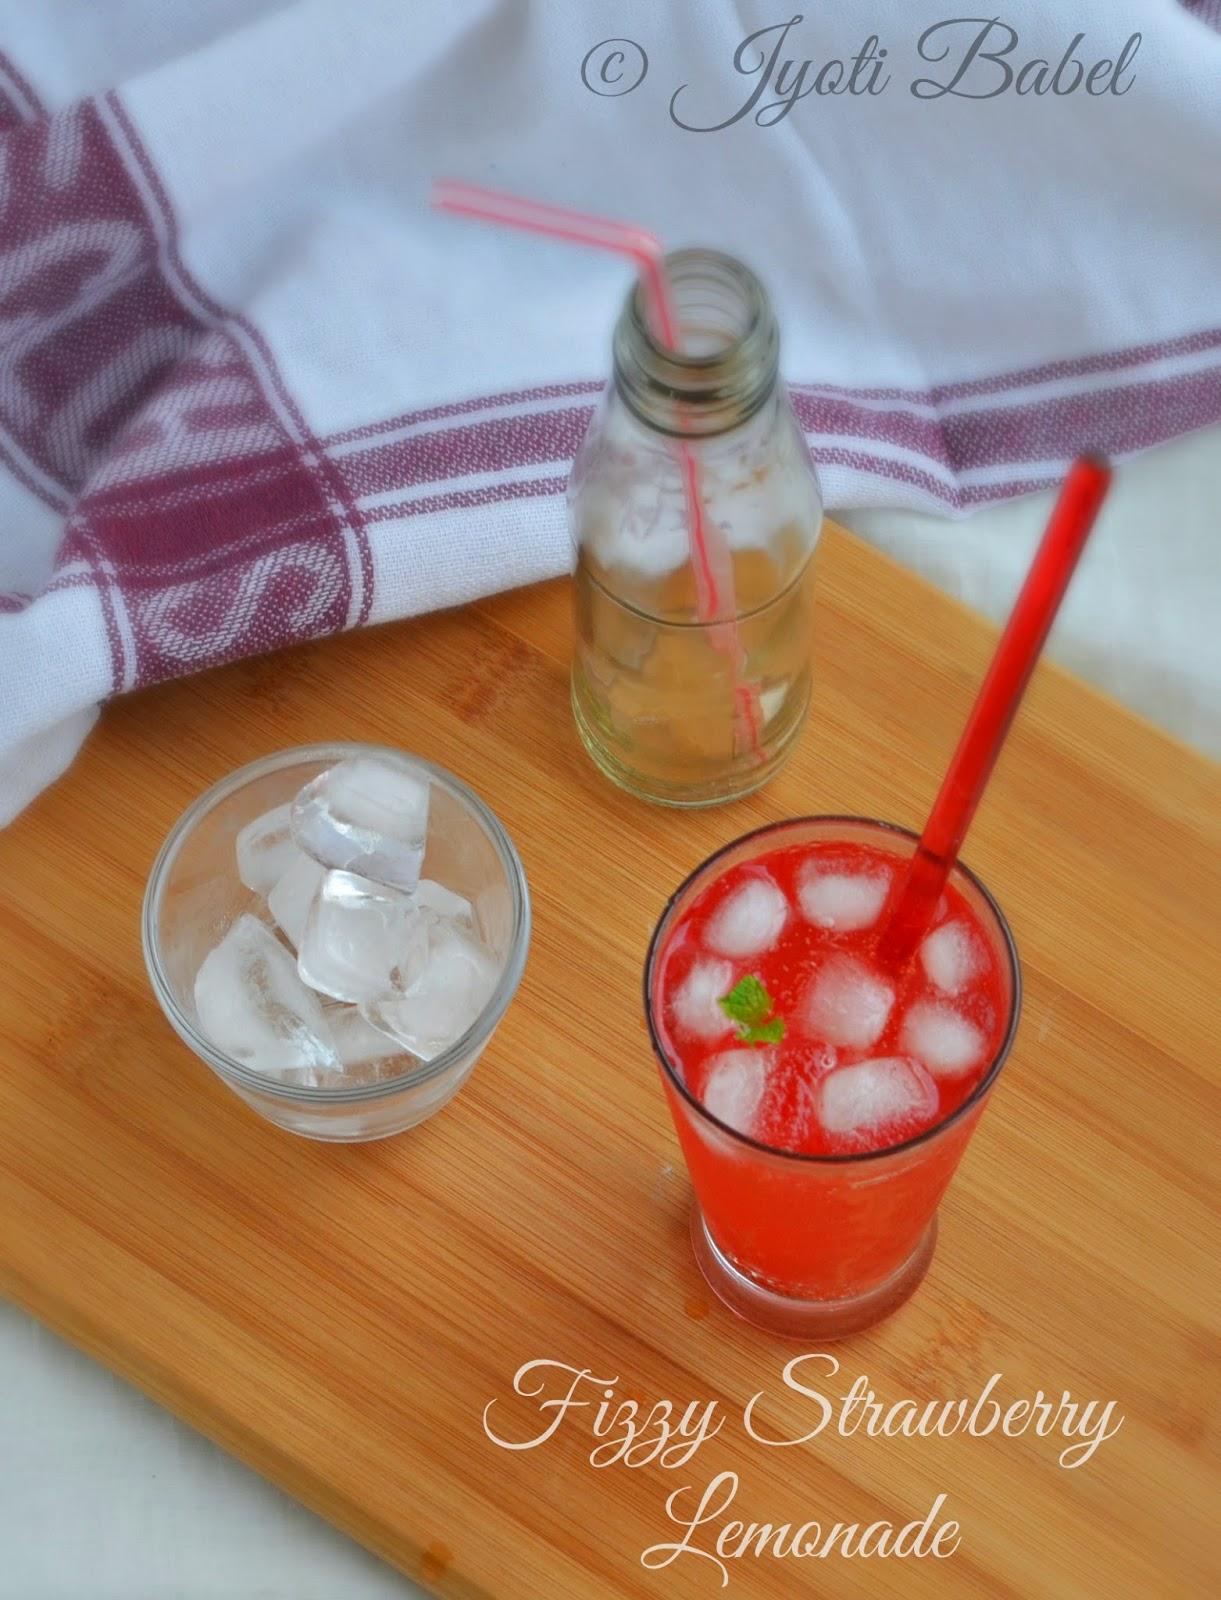 Fizzy Strawberry Lemonade Recipe | How to Make Strawberry Lemonade | Summer Drinks